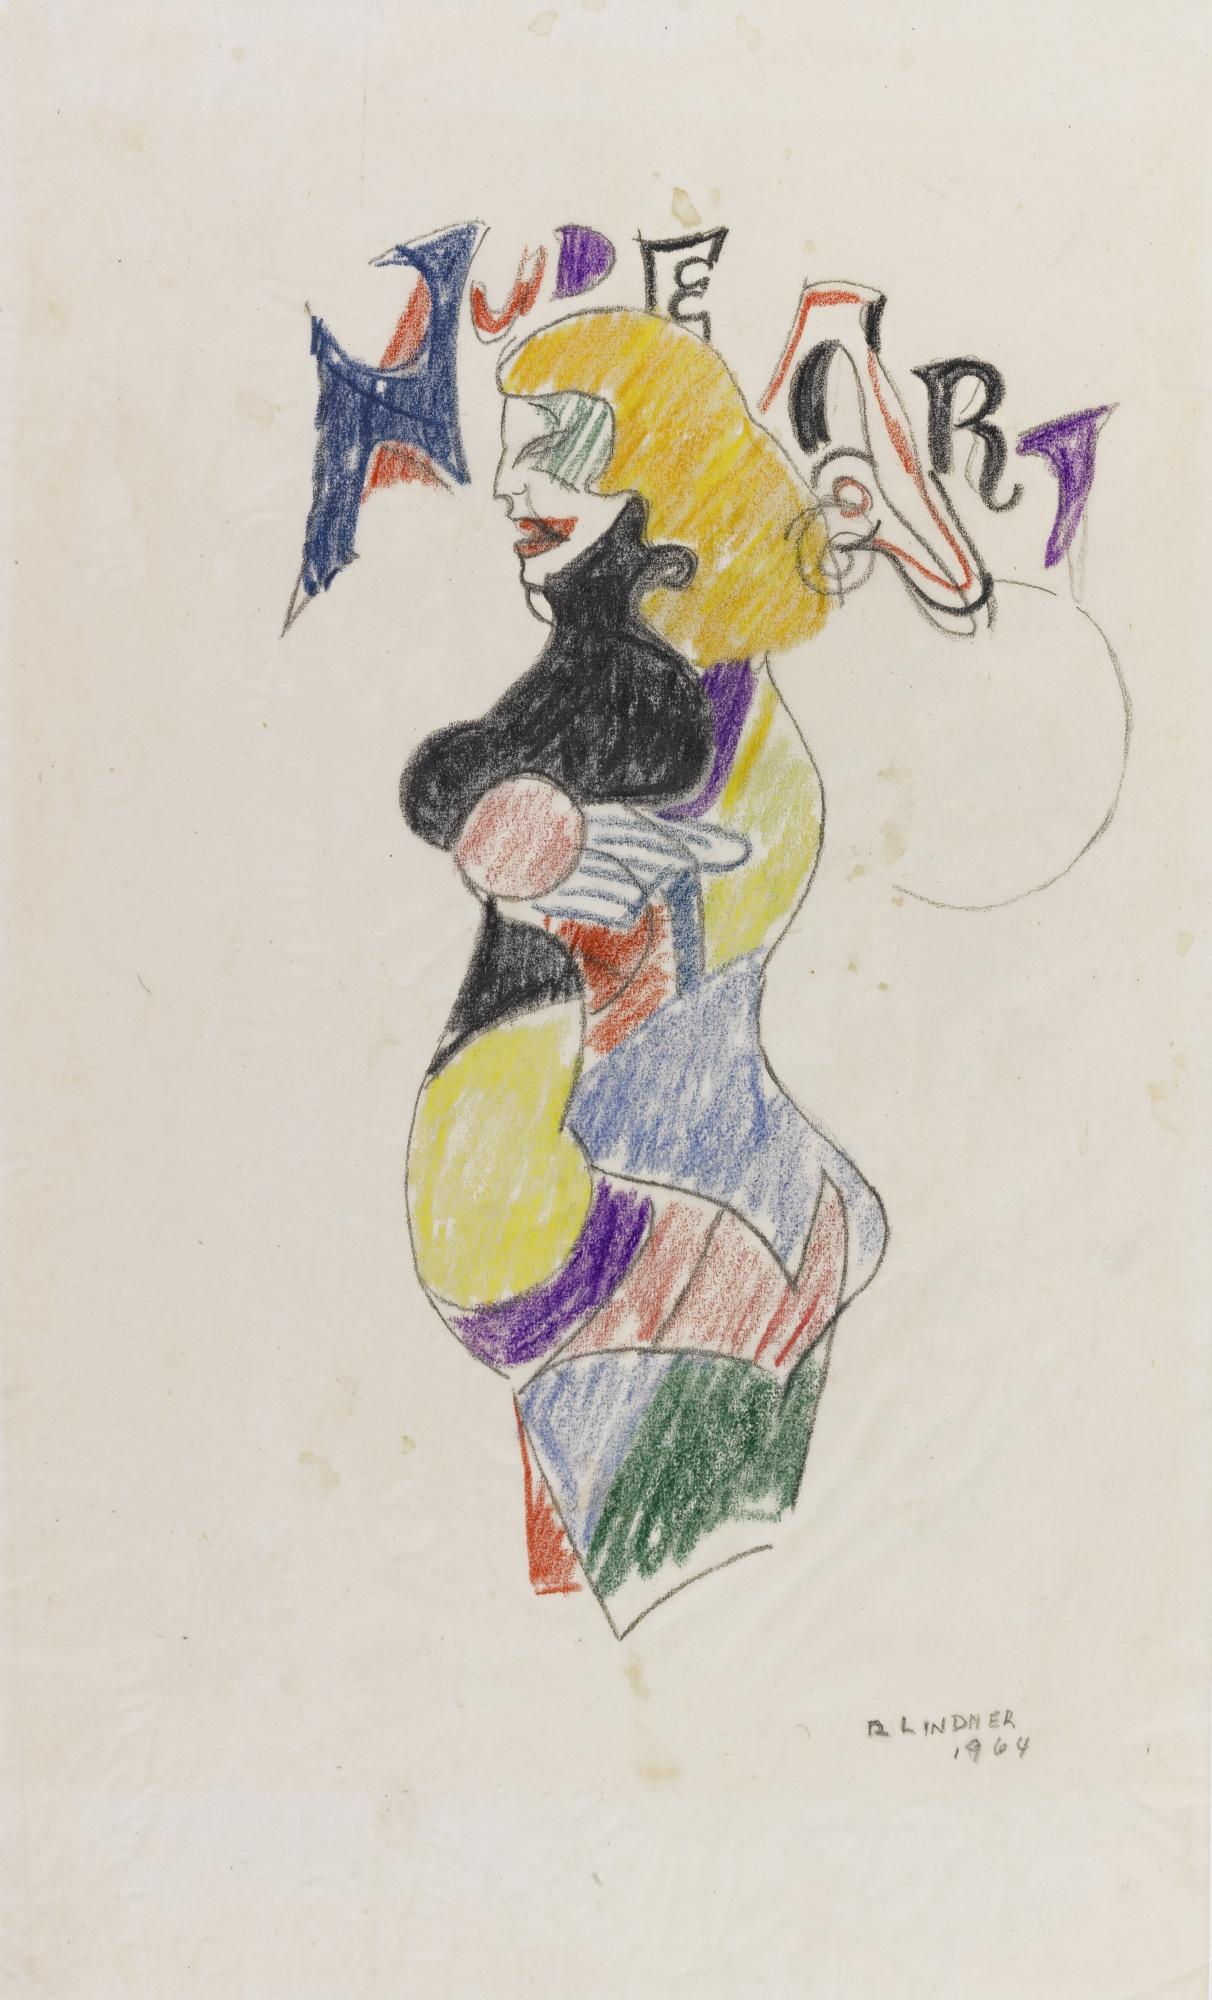 Richard Lindner-Nude Art-1964